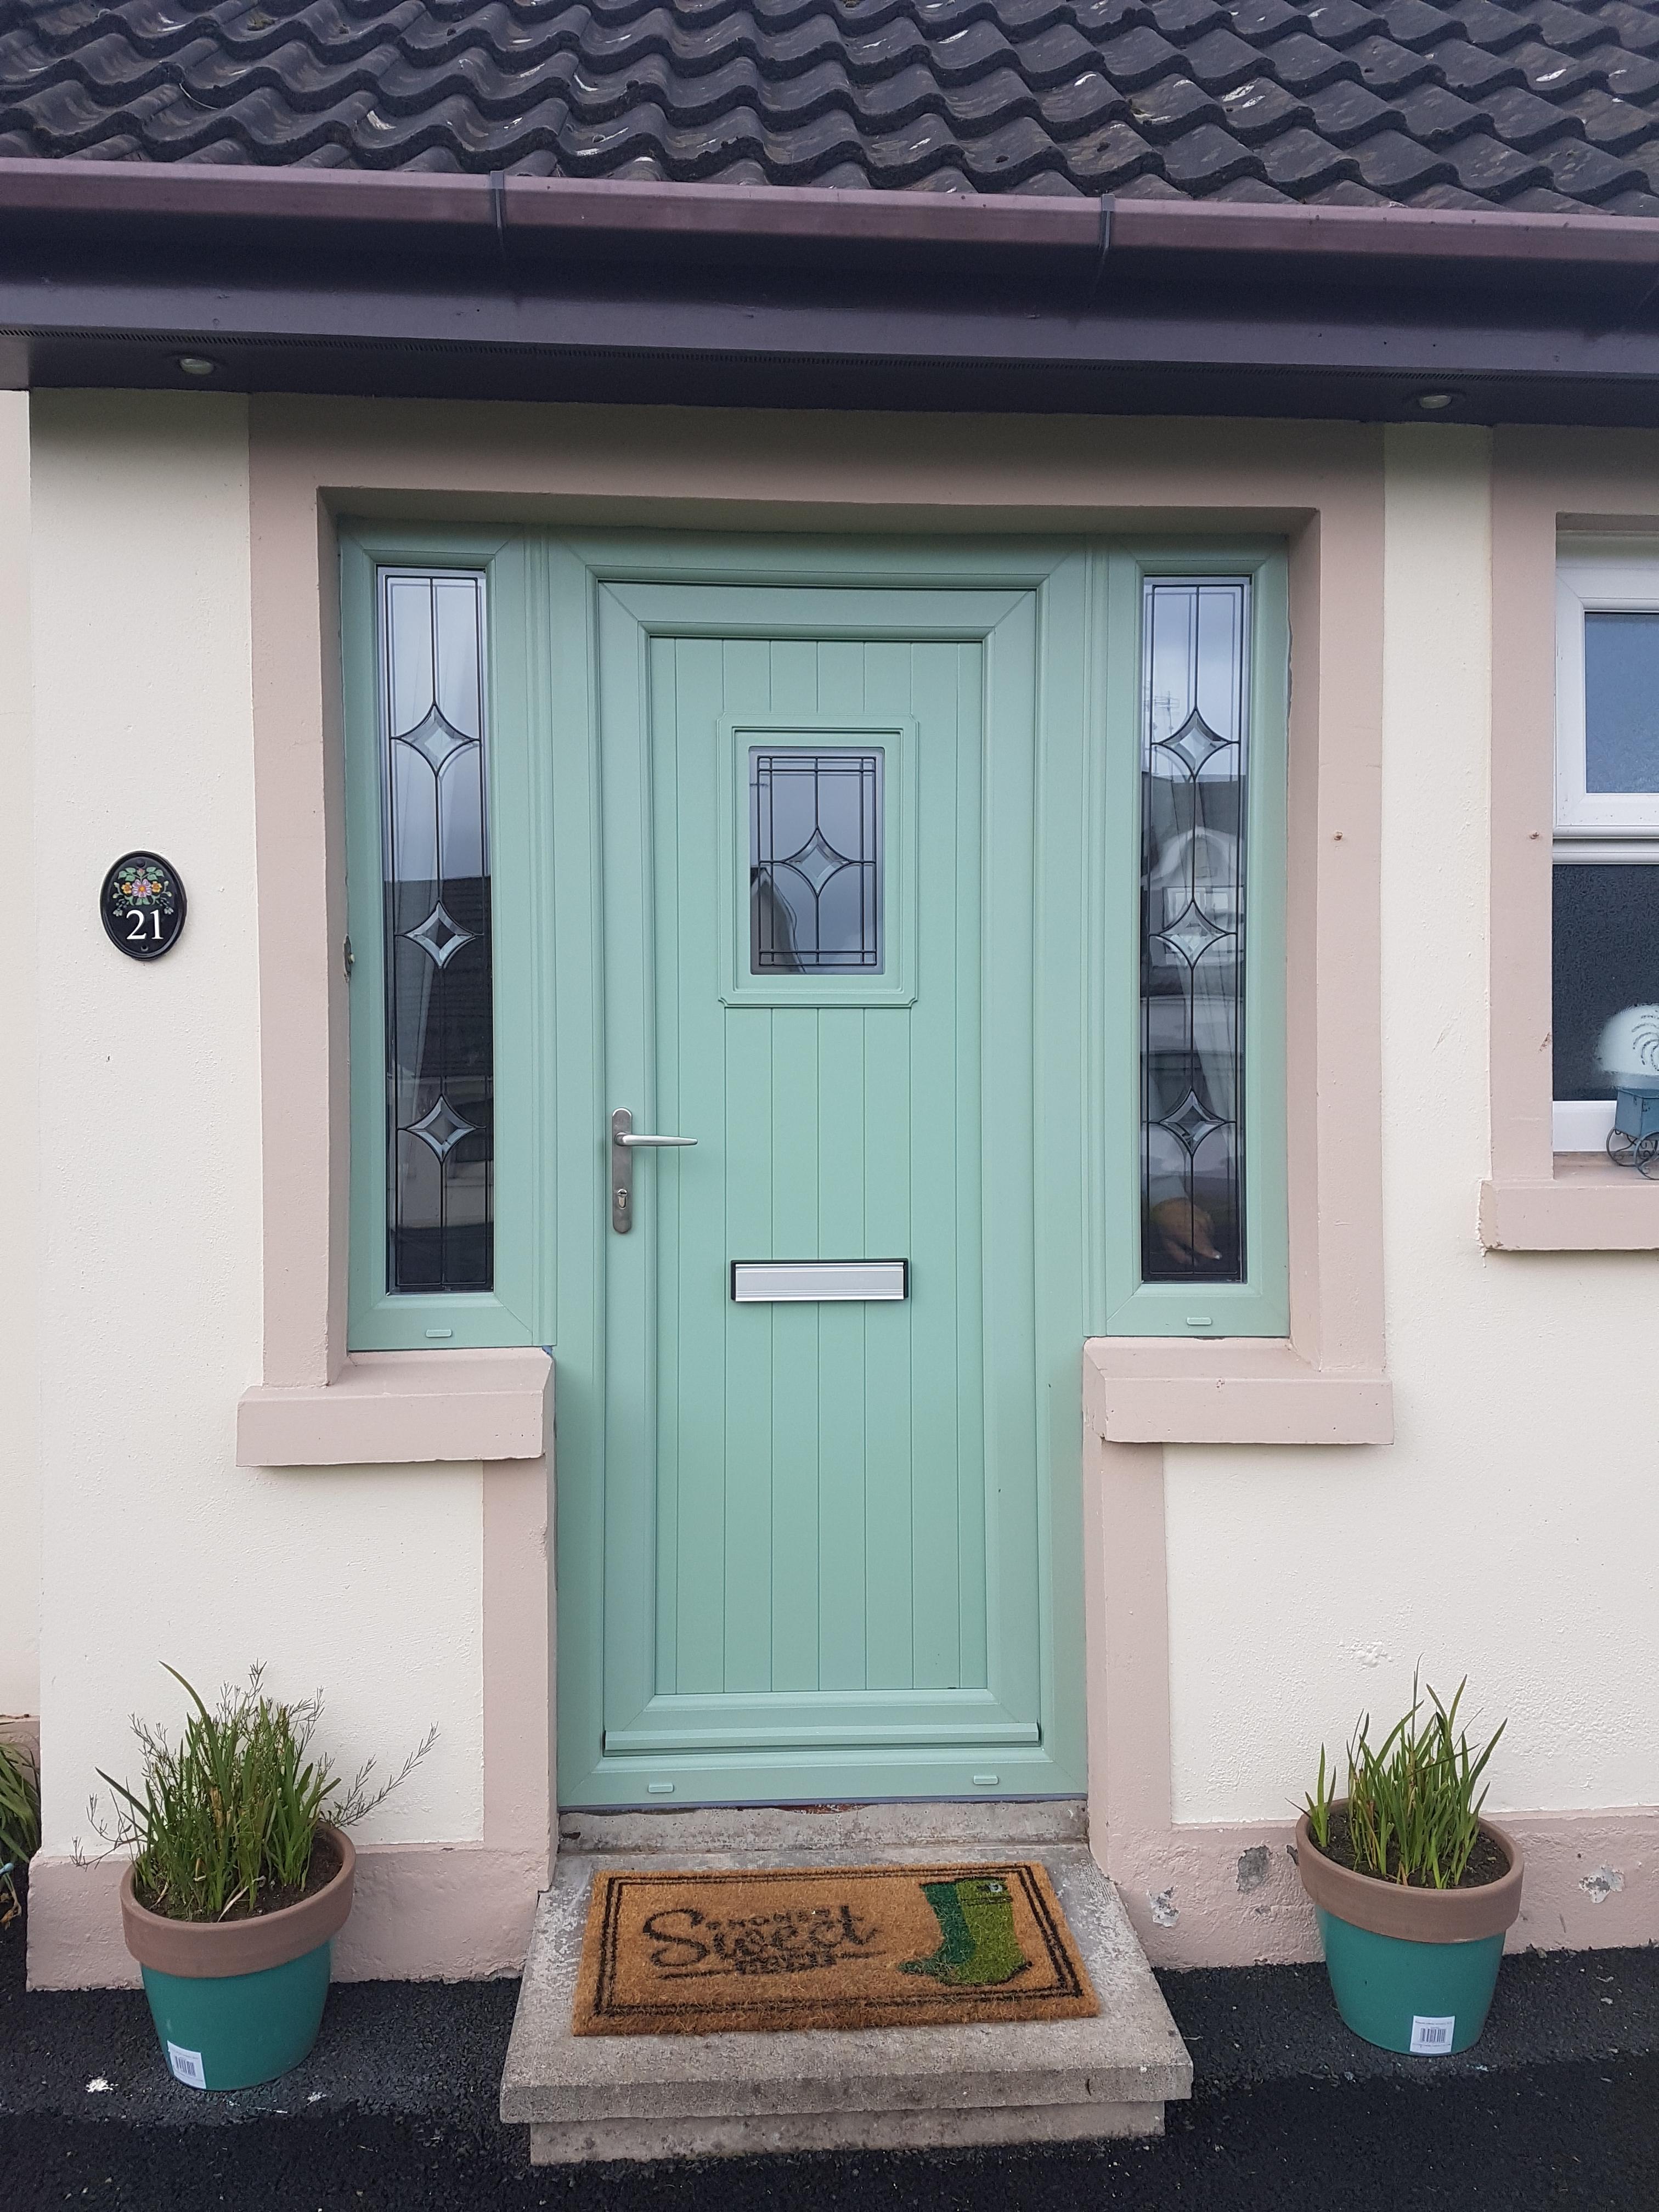 White VEKA Windows \u0026 Chartwell Green Door Installed & Fernisky Frames | Double Glazing in Ballymena Co. Antrim